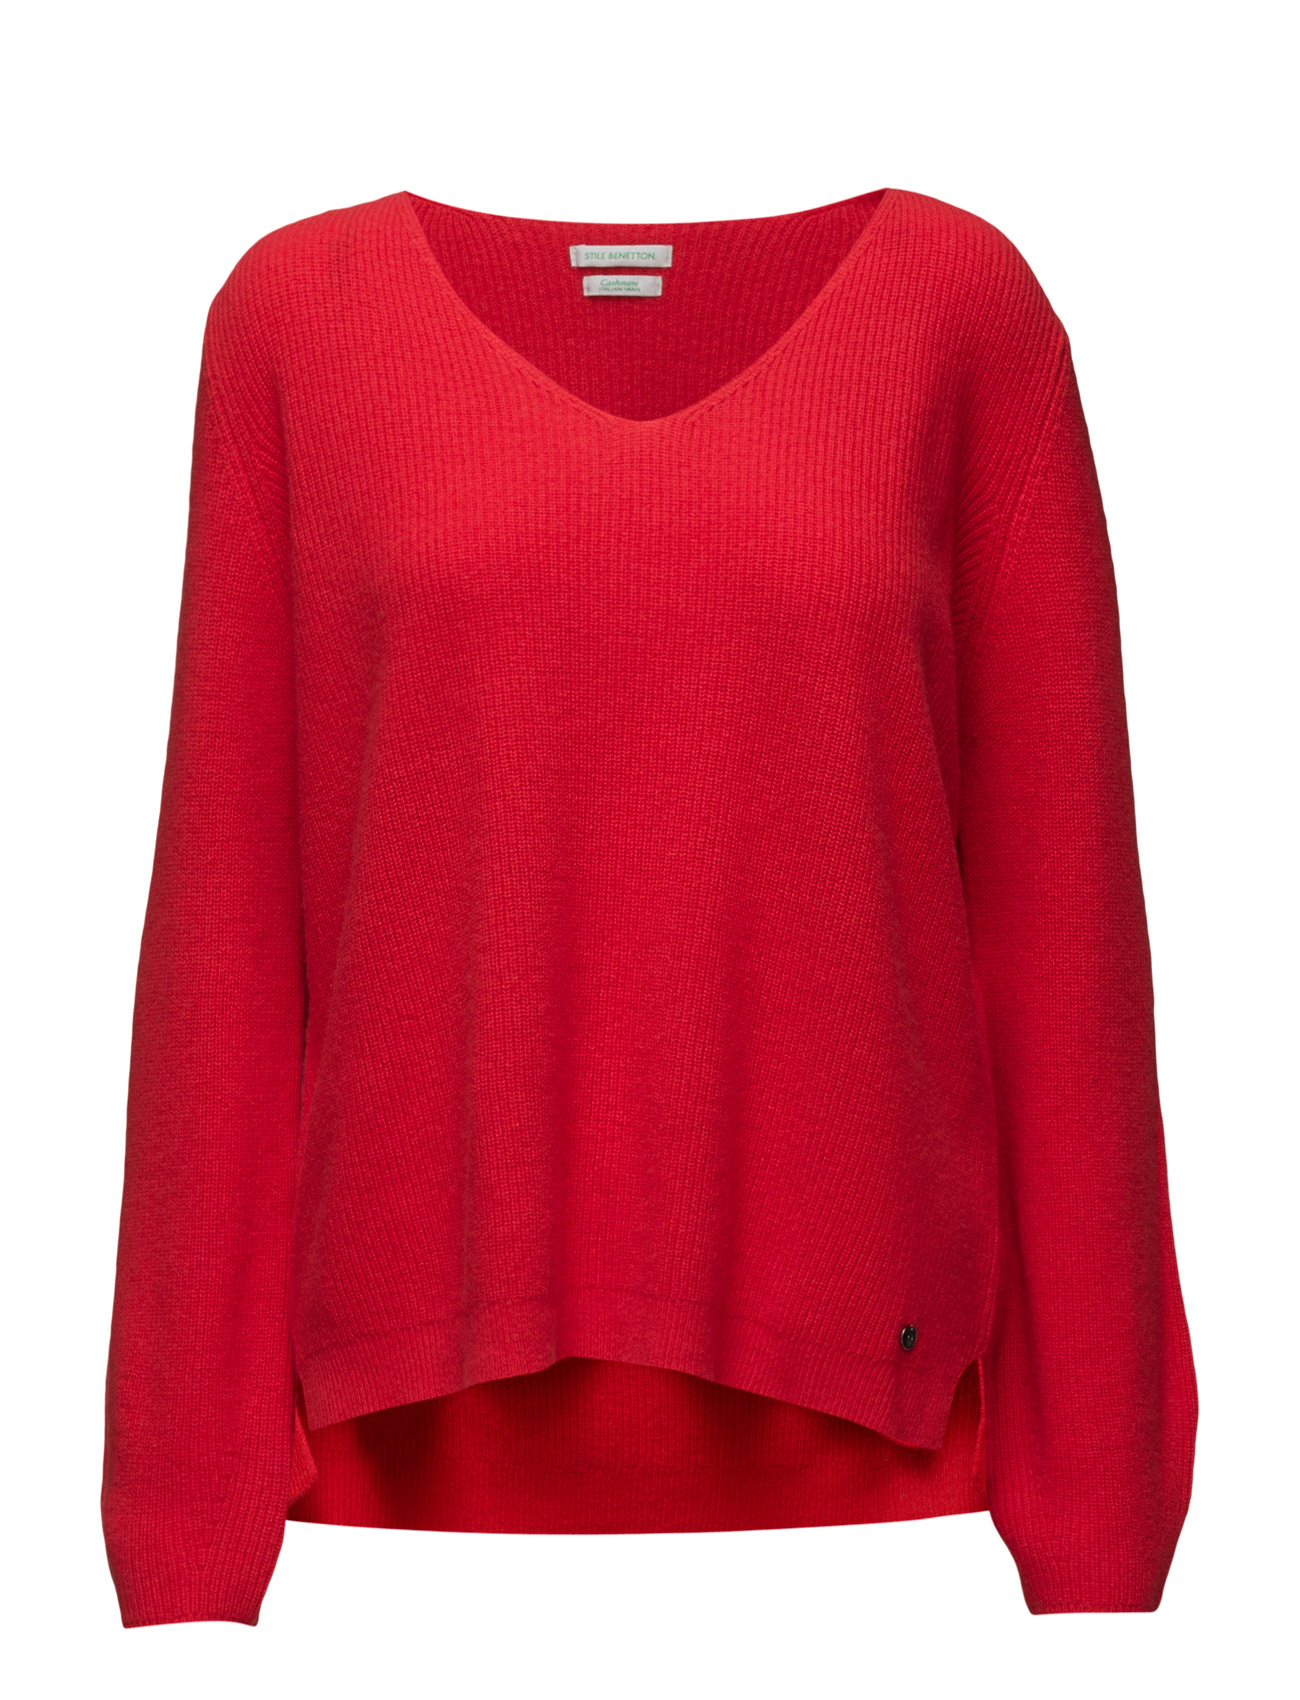 V Neck Sweater L/S United Colors of Benetton Sweatshirts til Damer i 0B6